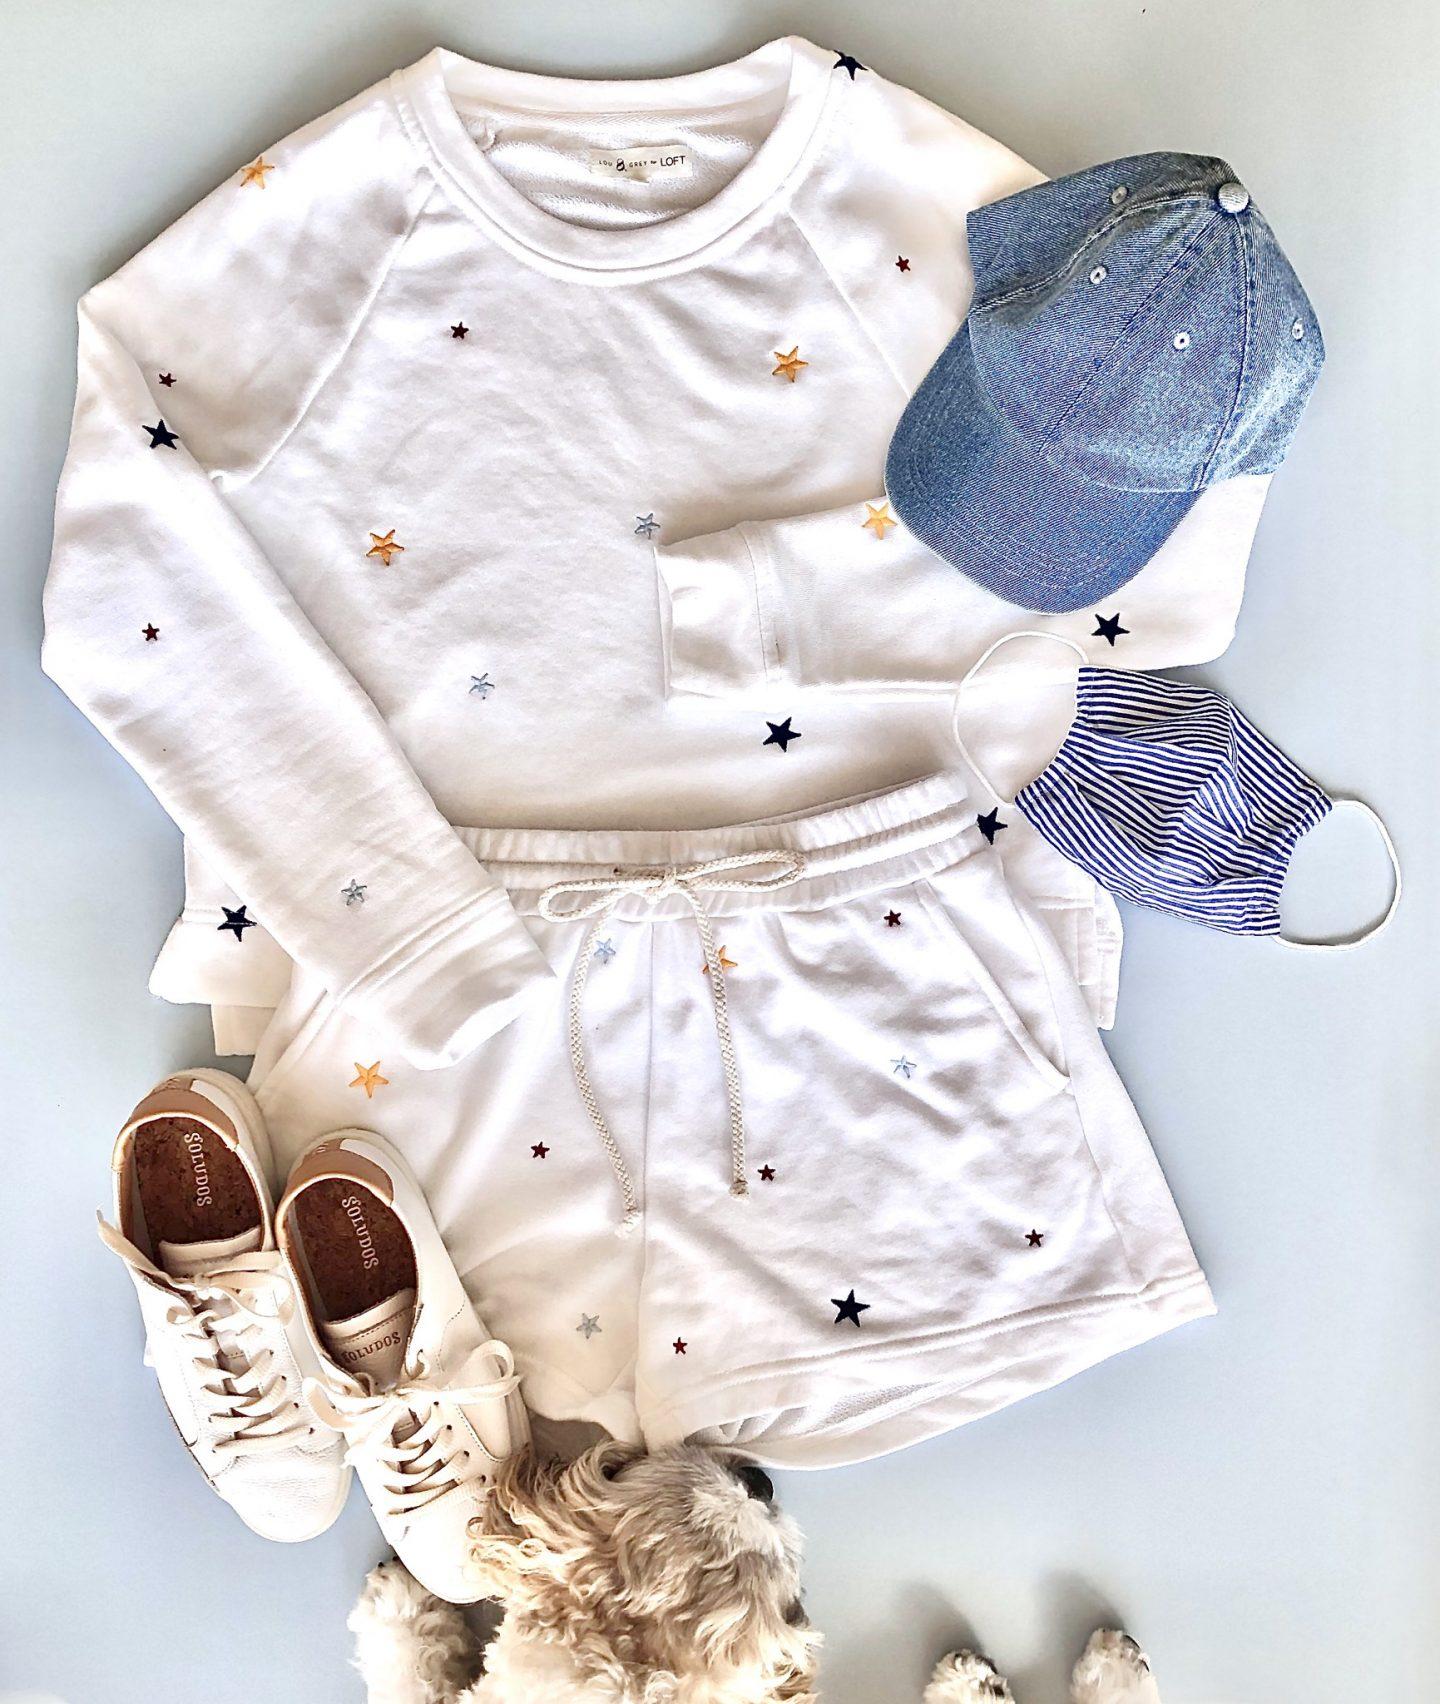 Lou & Grey Star Terry Sweatshirt Set, size XS